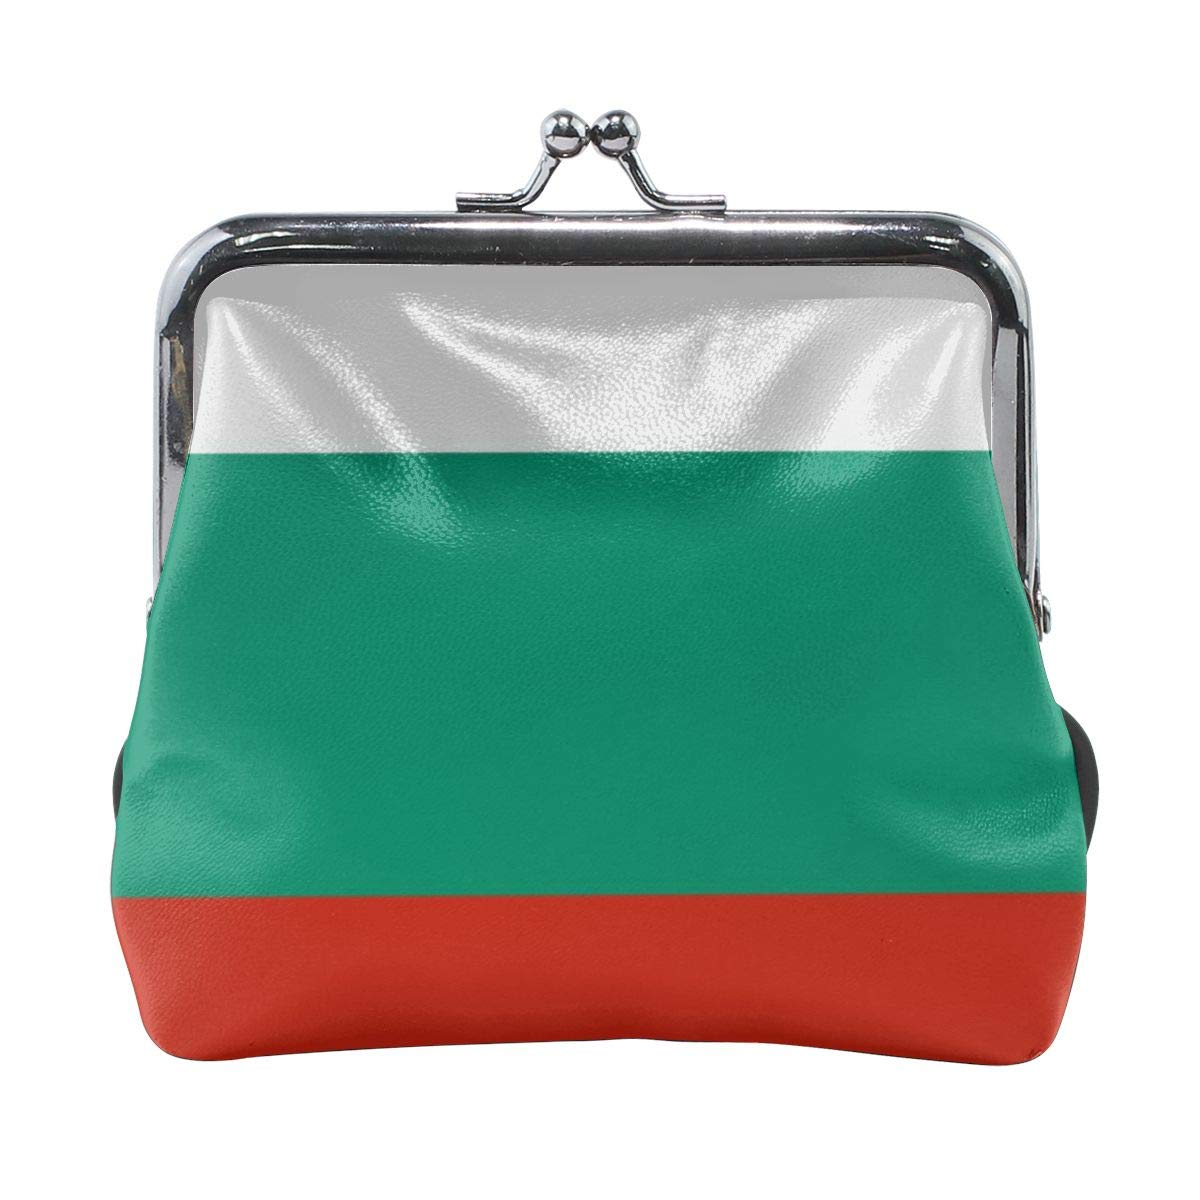 Bulgarian Flag Cute Buckle Coin Purses Buckle Buckle Change Purse Wallets